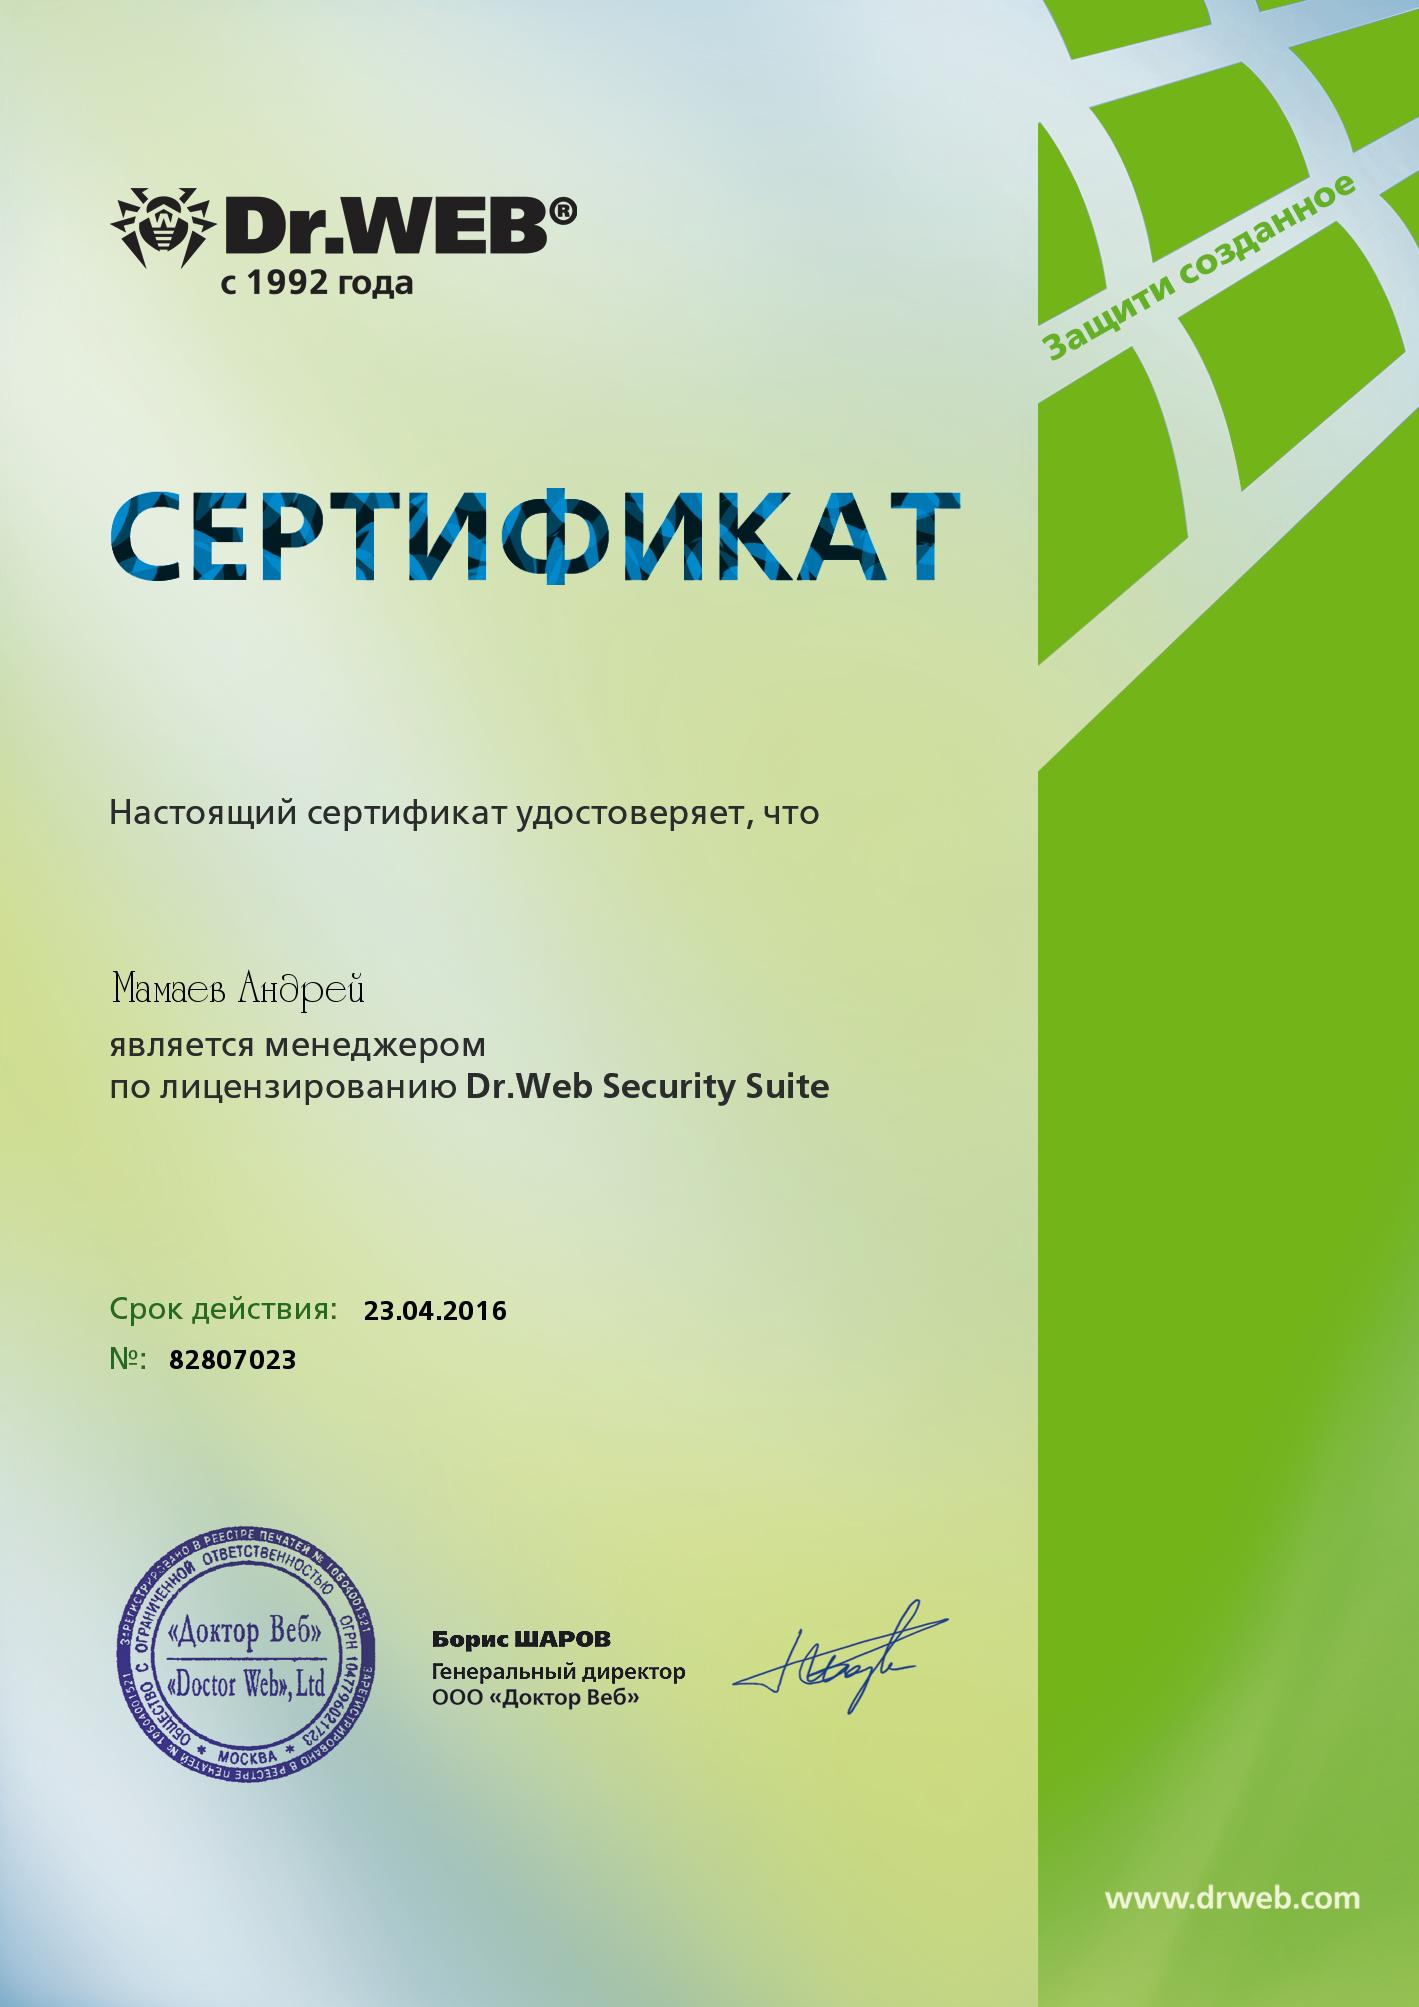 (DWCERT-020-1) Dr Web Security Suite (Мамаев) 23.04.2016